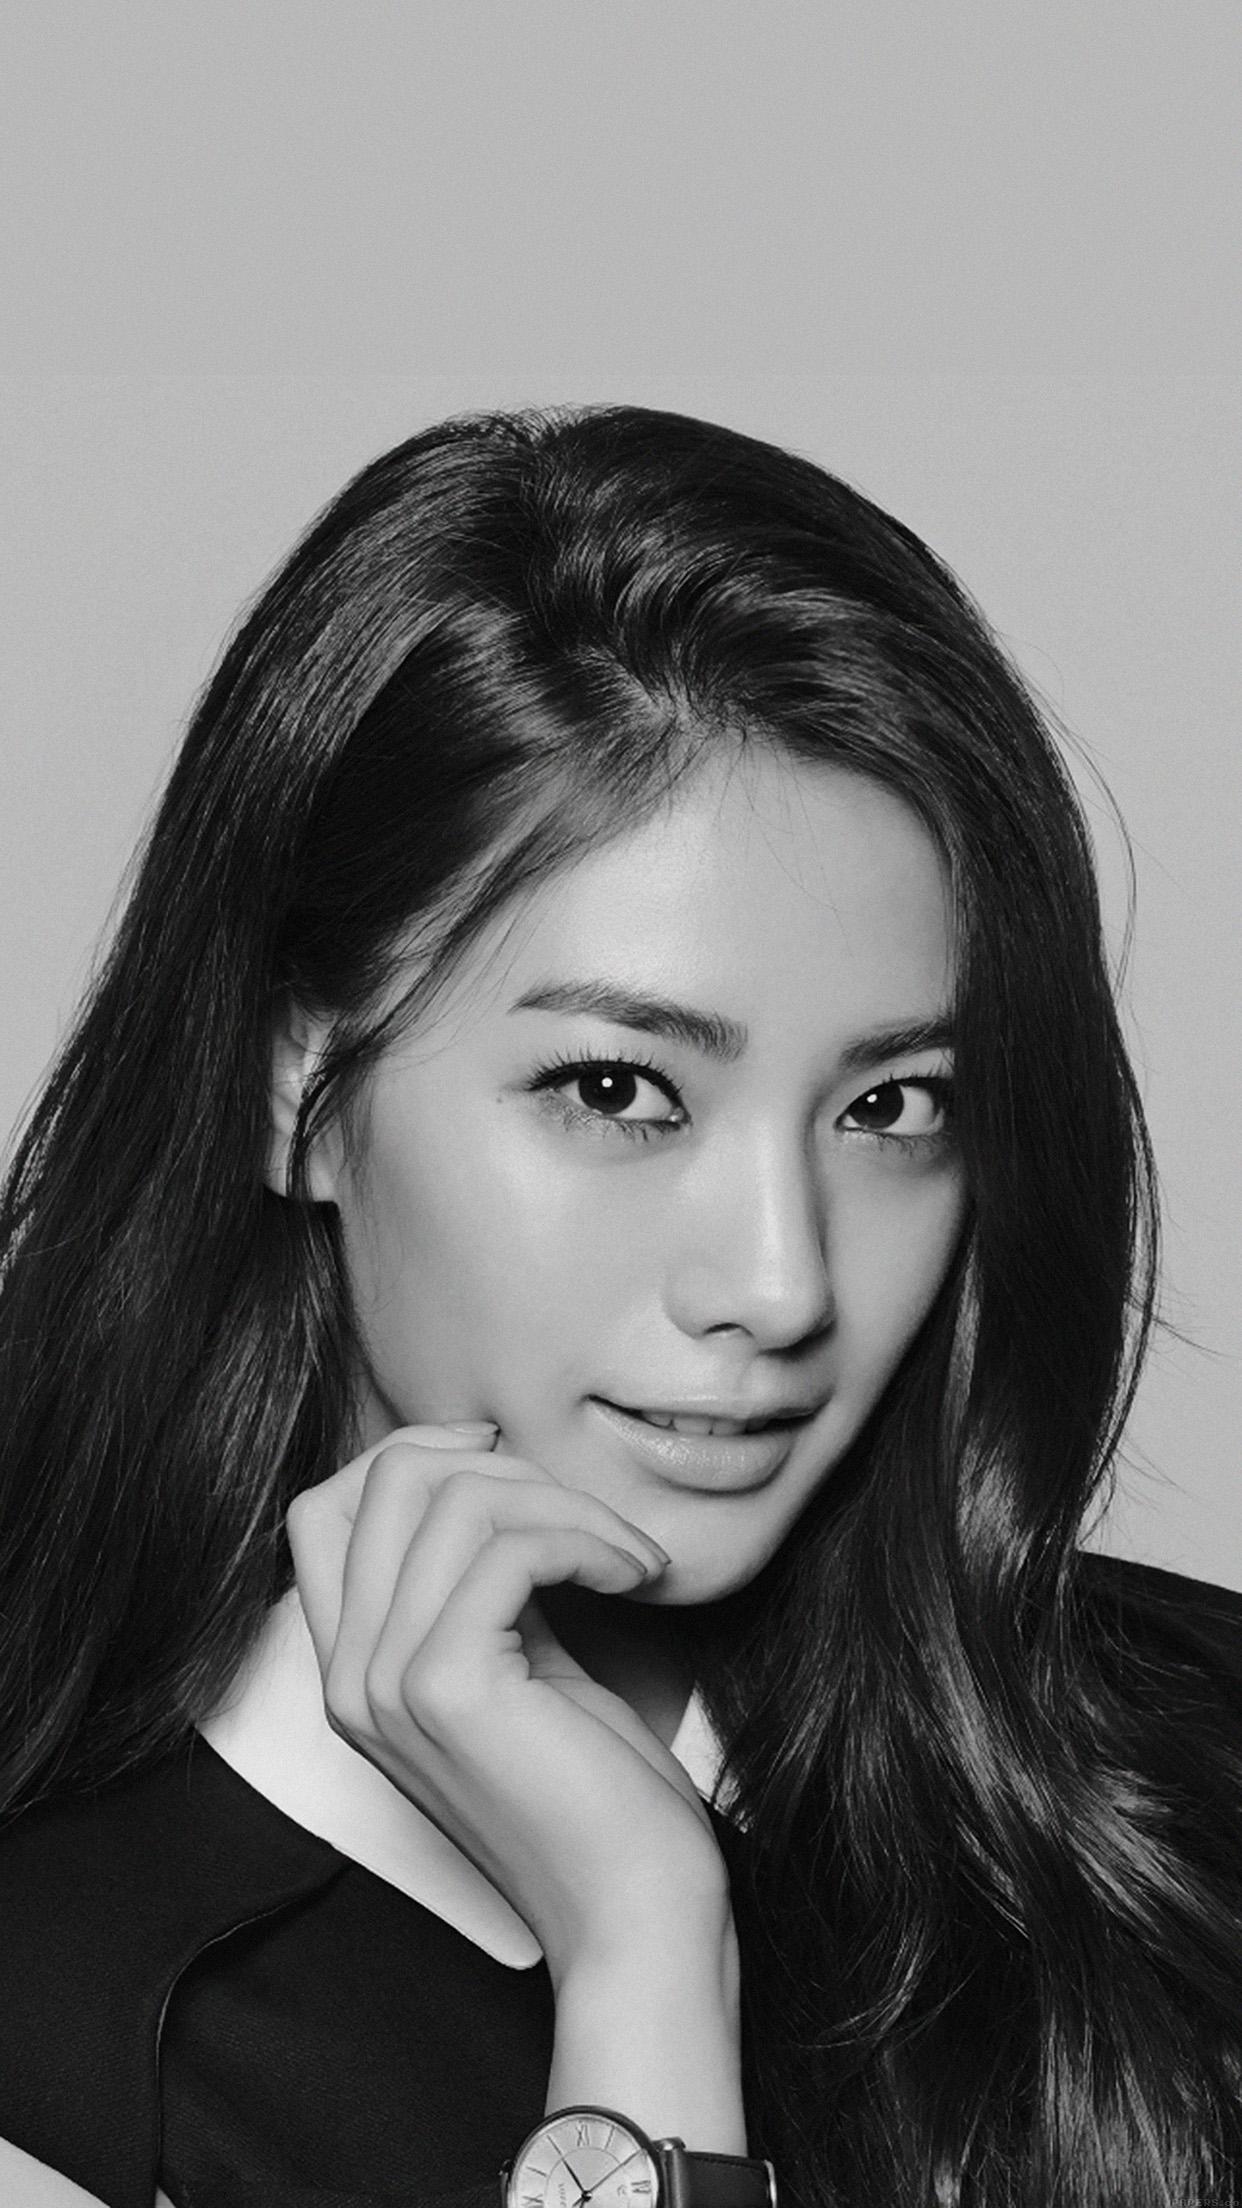 hd62-nana-kpop-idol-dark-bw-music-sexy-girl - Papers.co